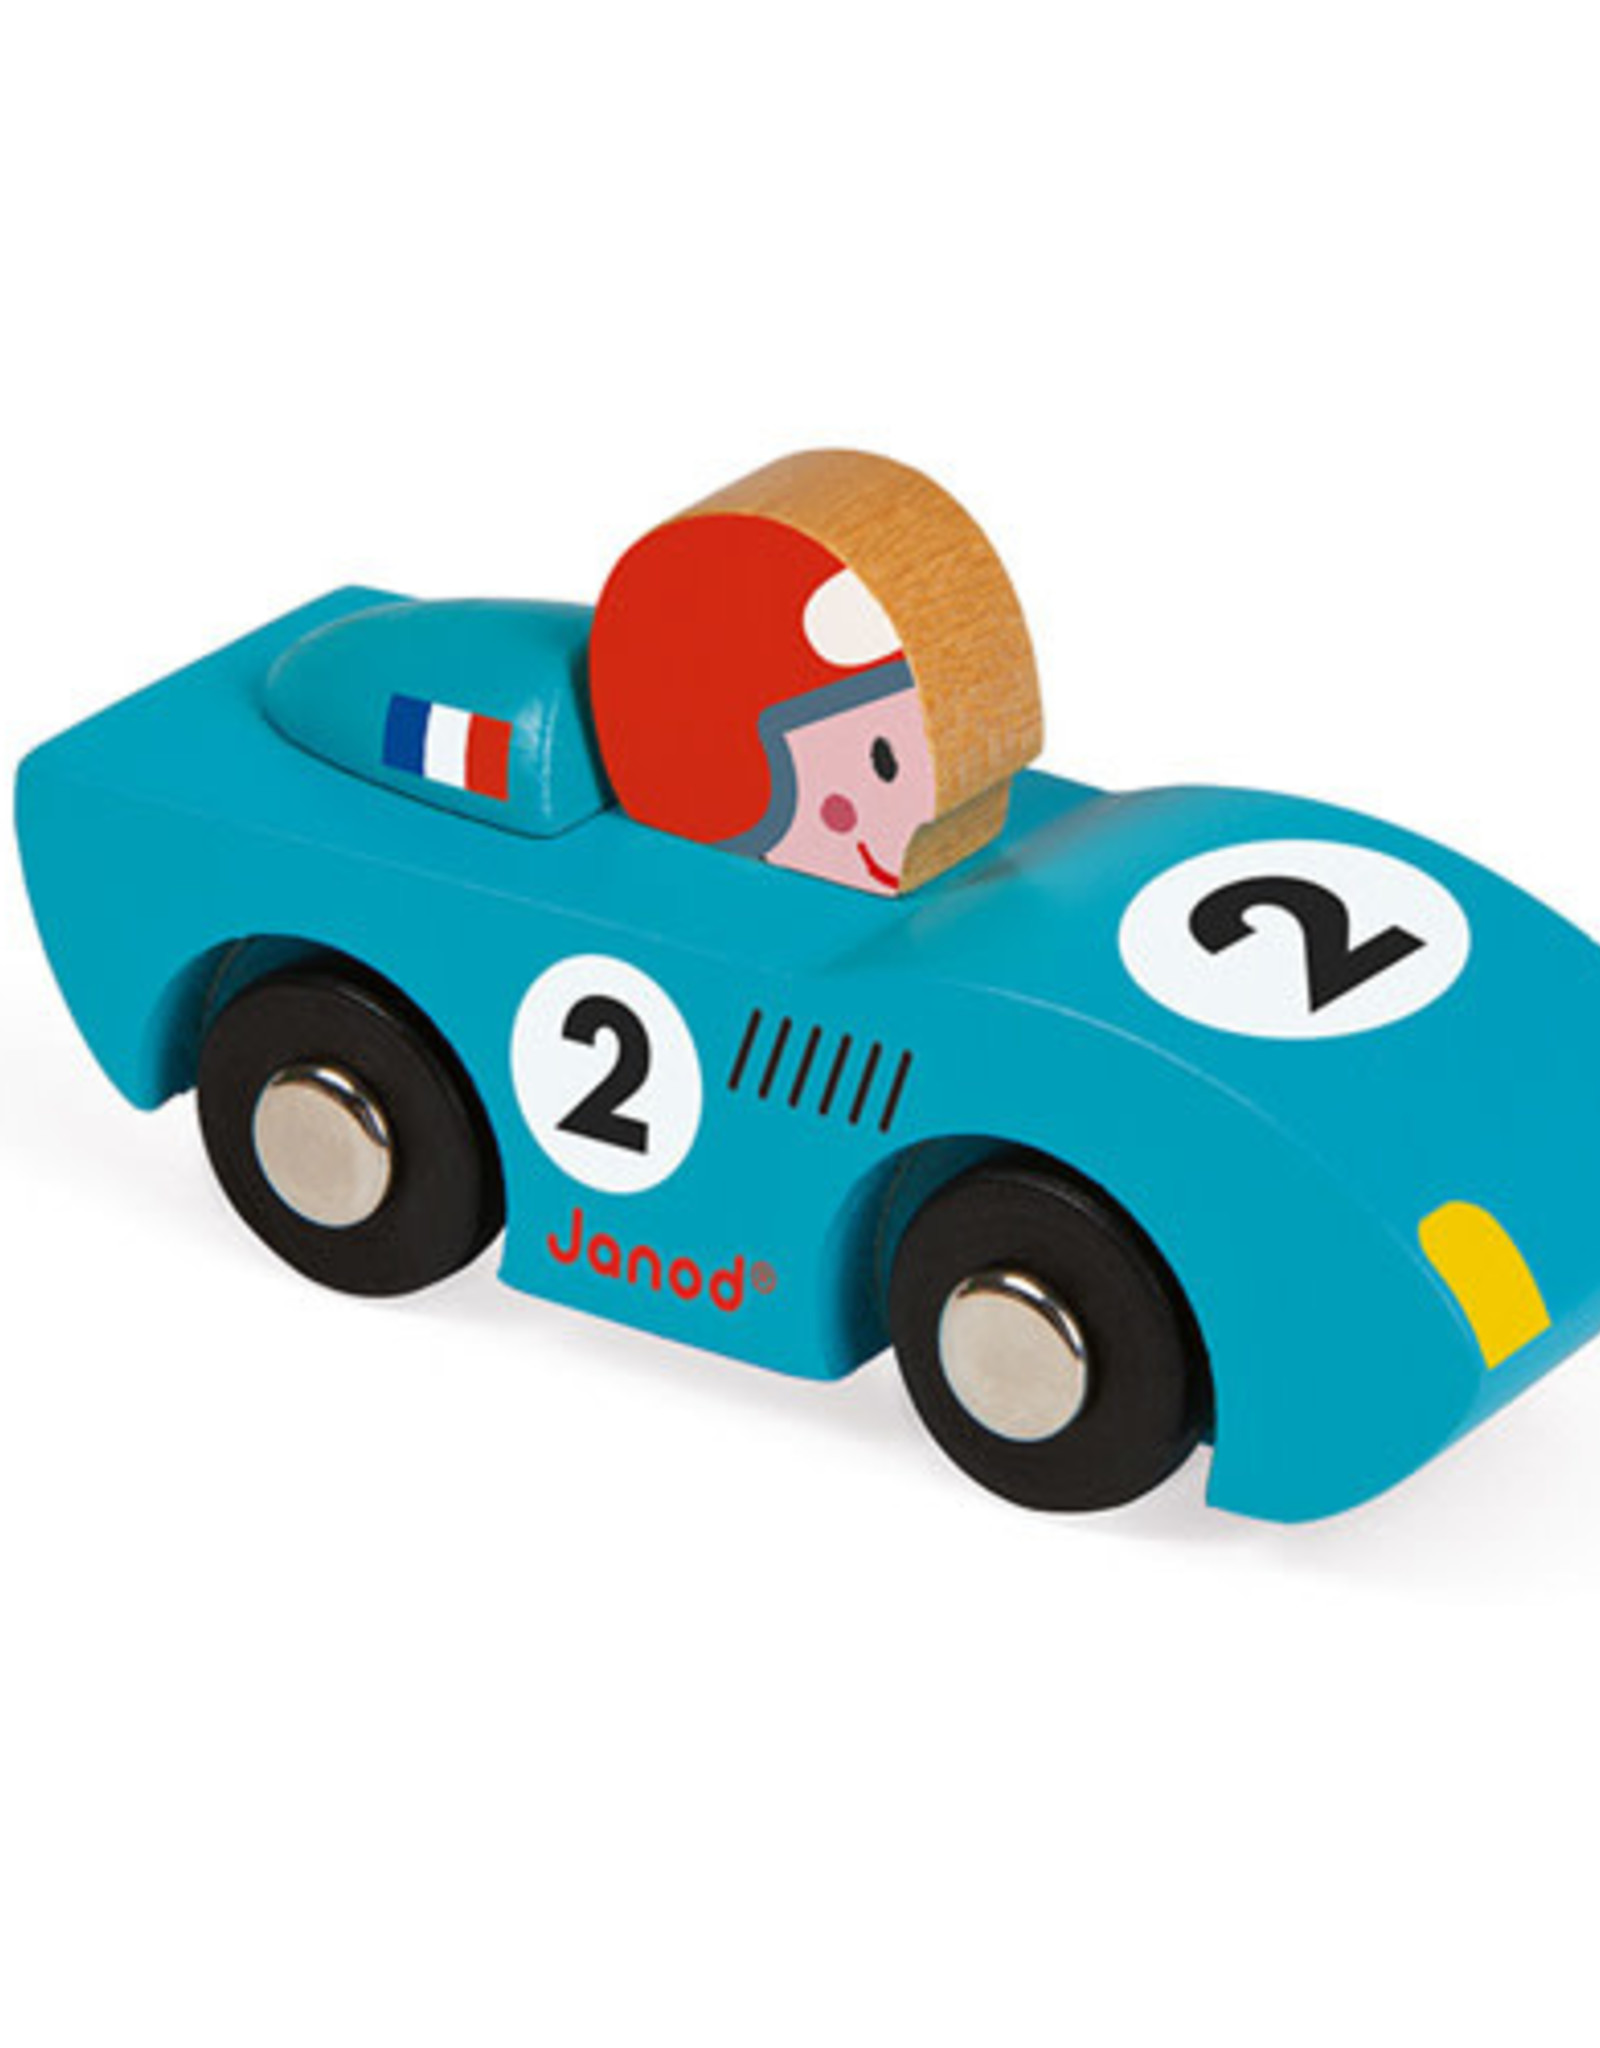 Janod Autootje Story Racing Speed blauw